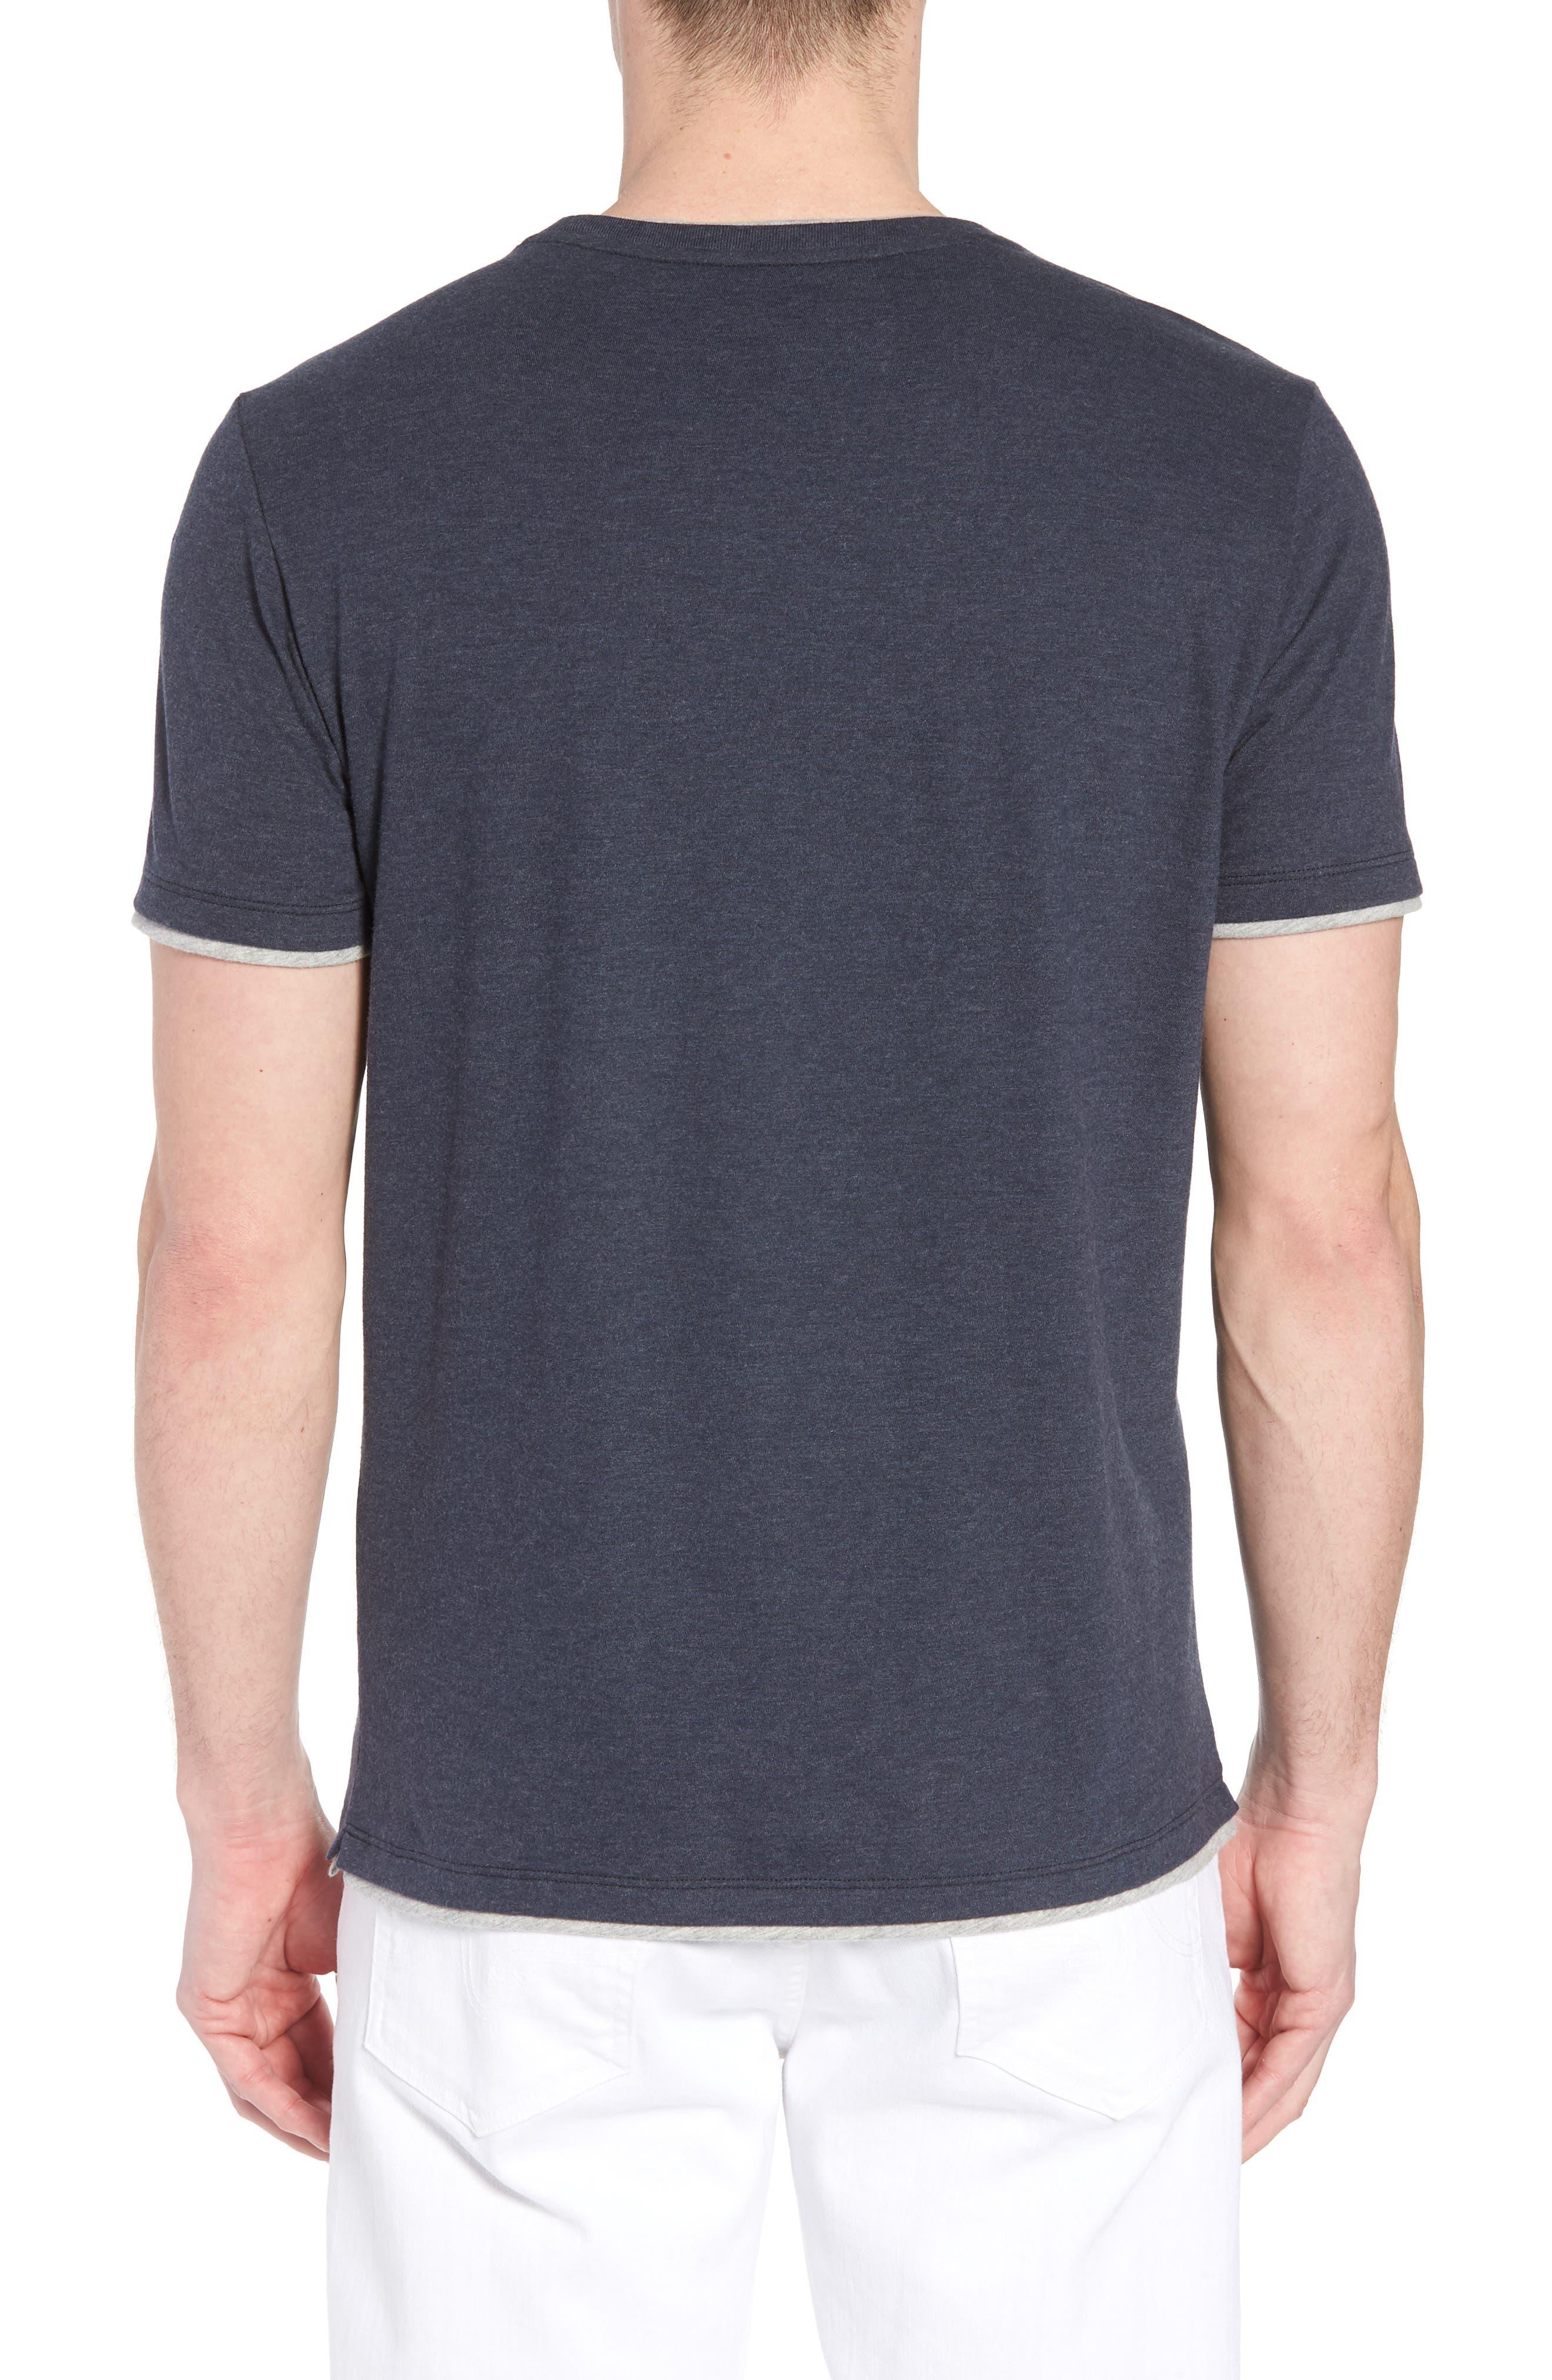 Halifax Crewneck T-Shirt,                             Alternate thumbnail 2, color,                             NAVY